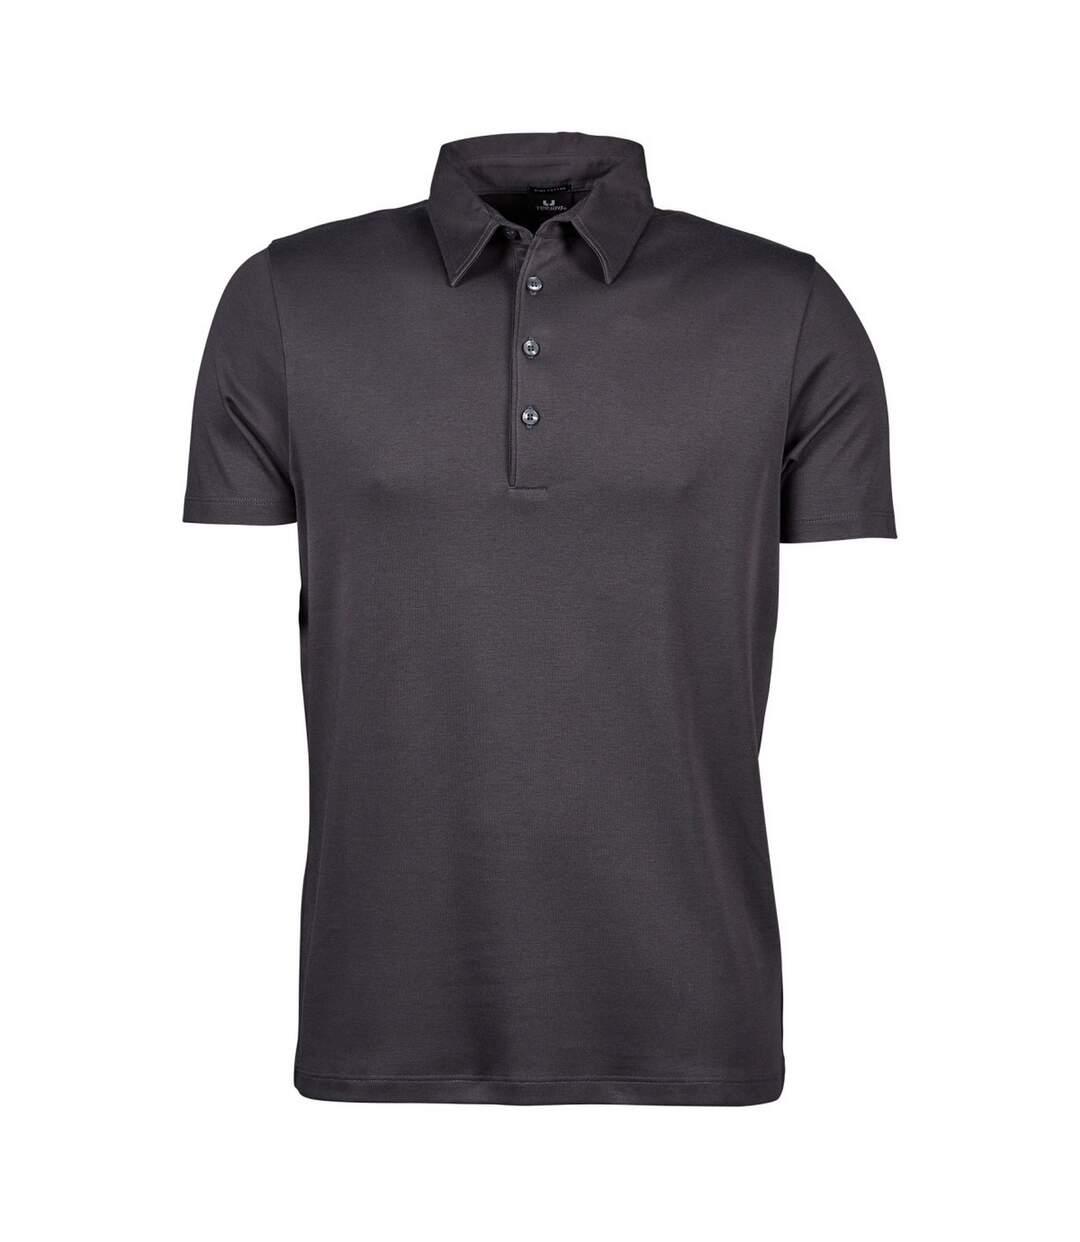 Tee Jays Mens Pima Short Sleeve Cotton Polo Shirt (Dark Grey) - UTBC3812